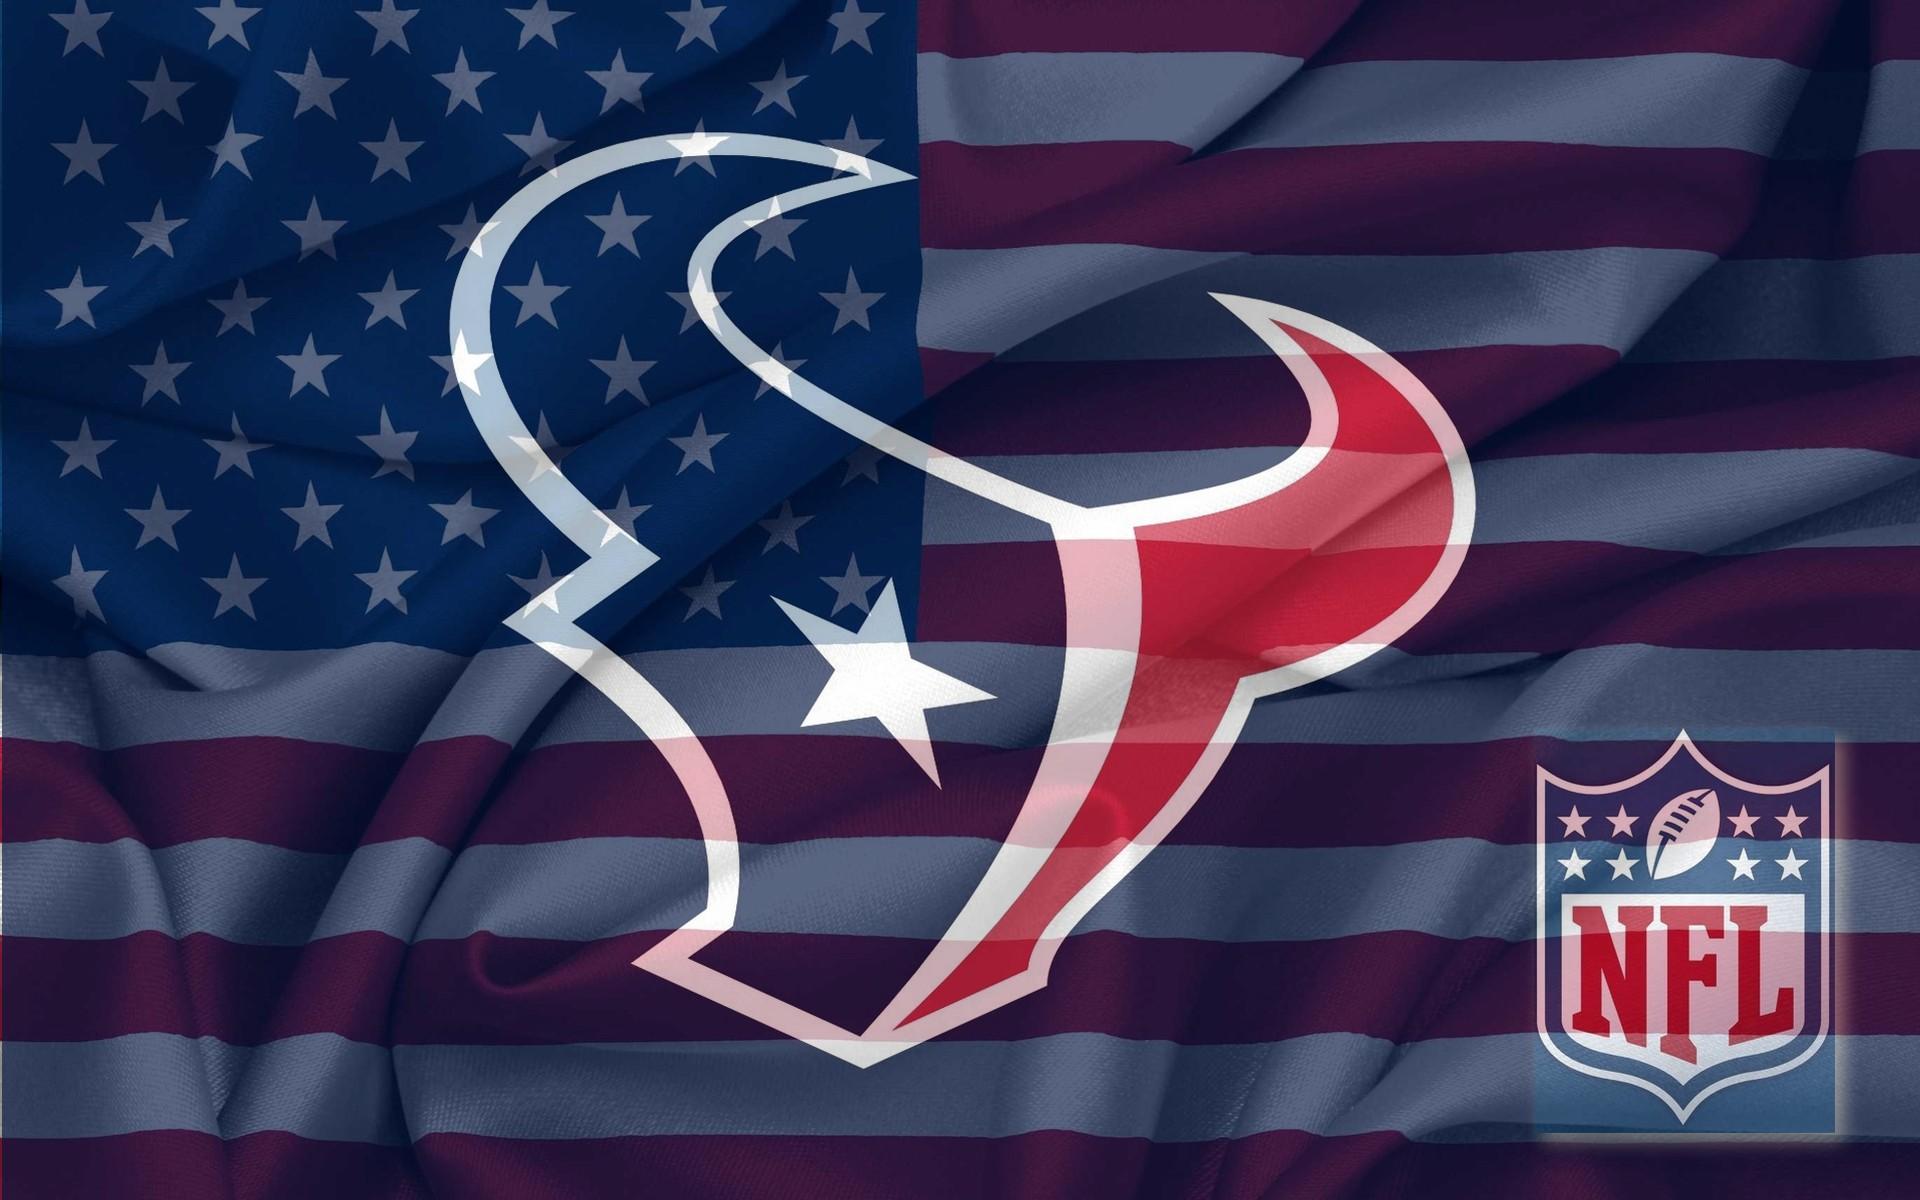 Houston Texans Screensavers And Wallpaper